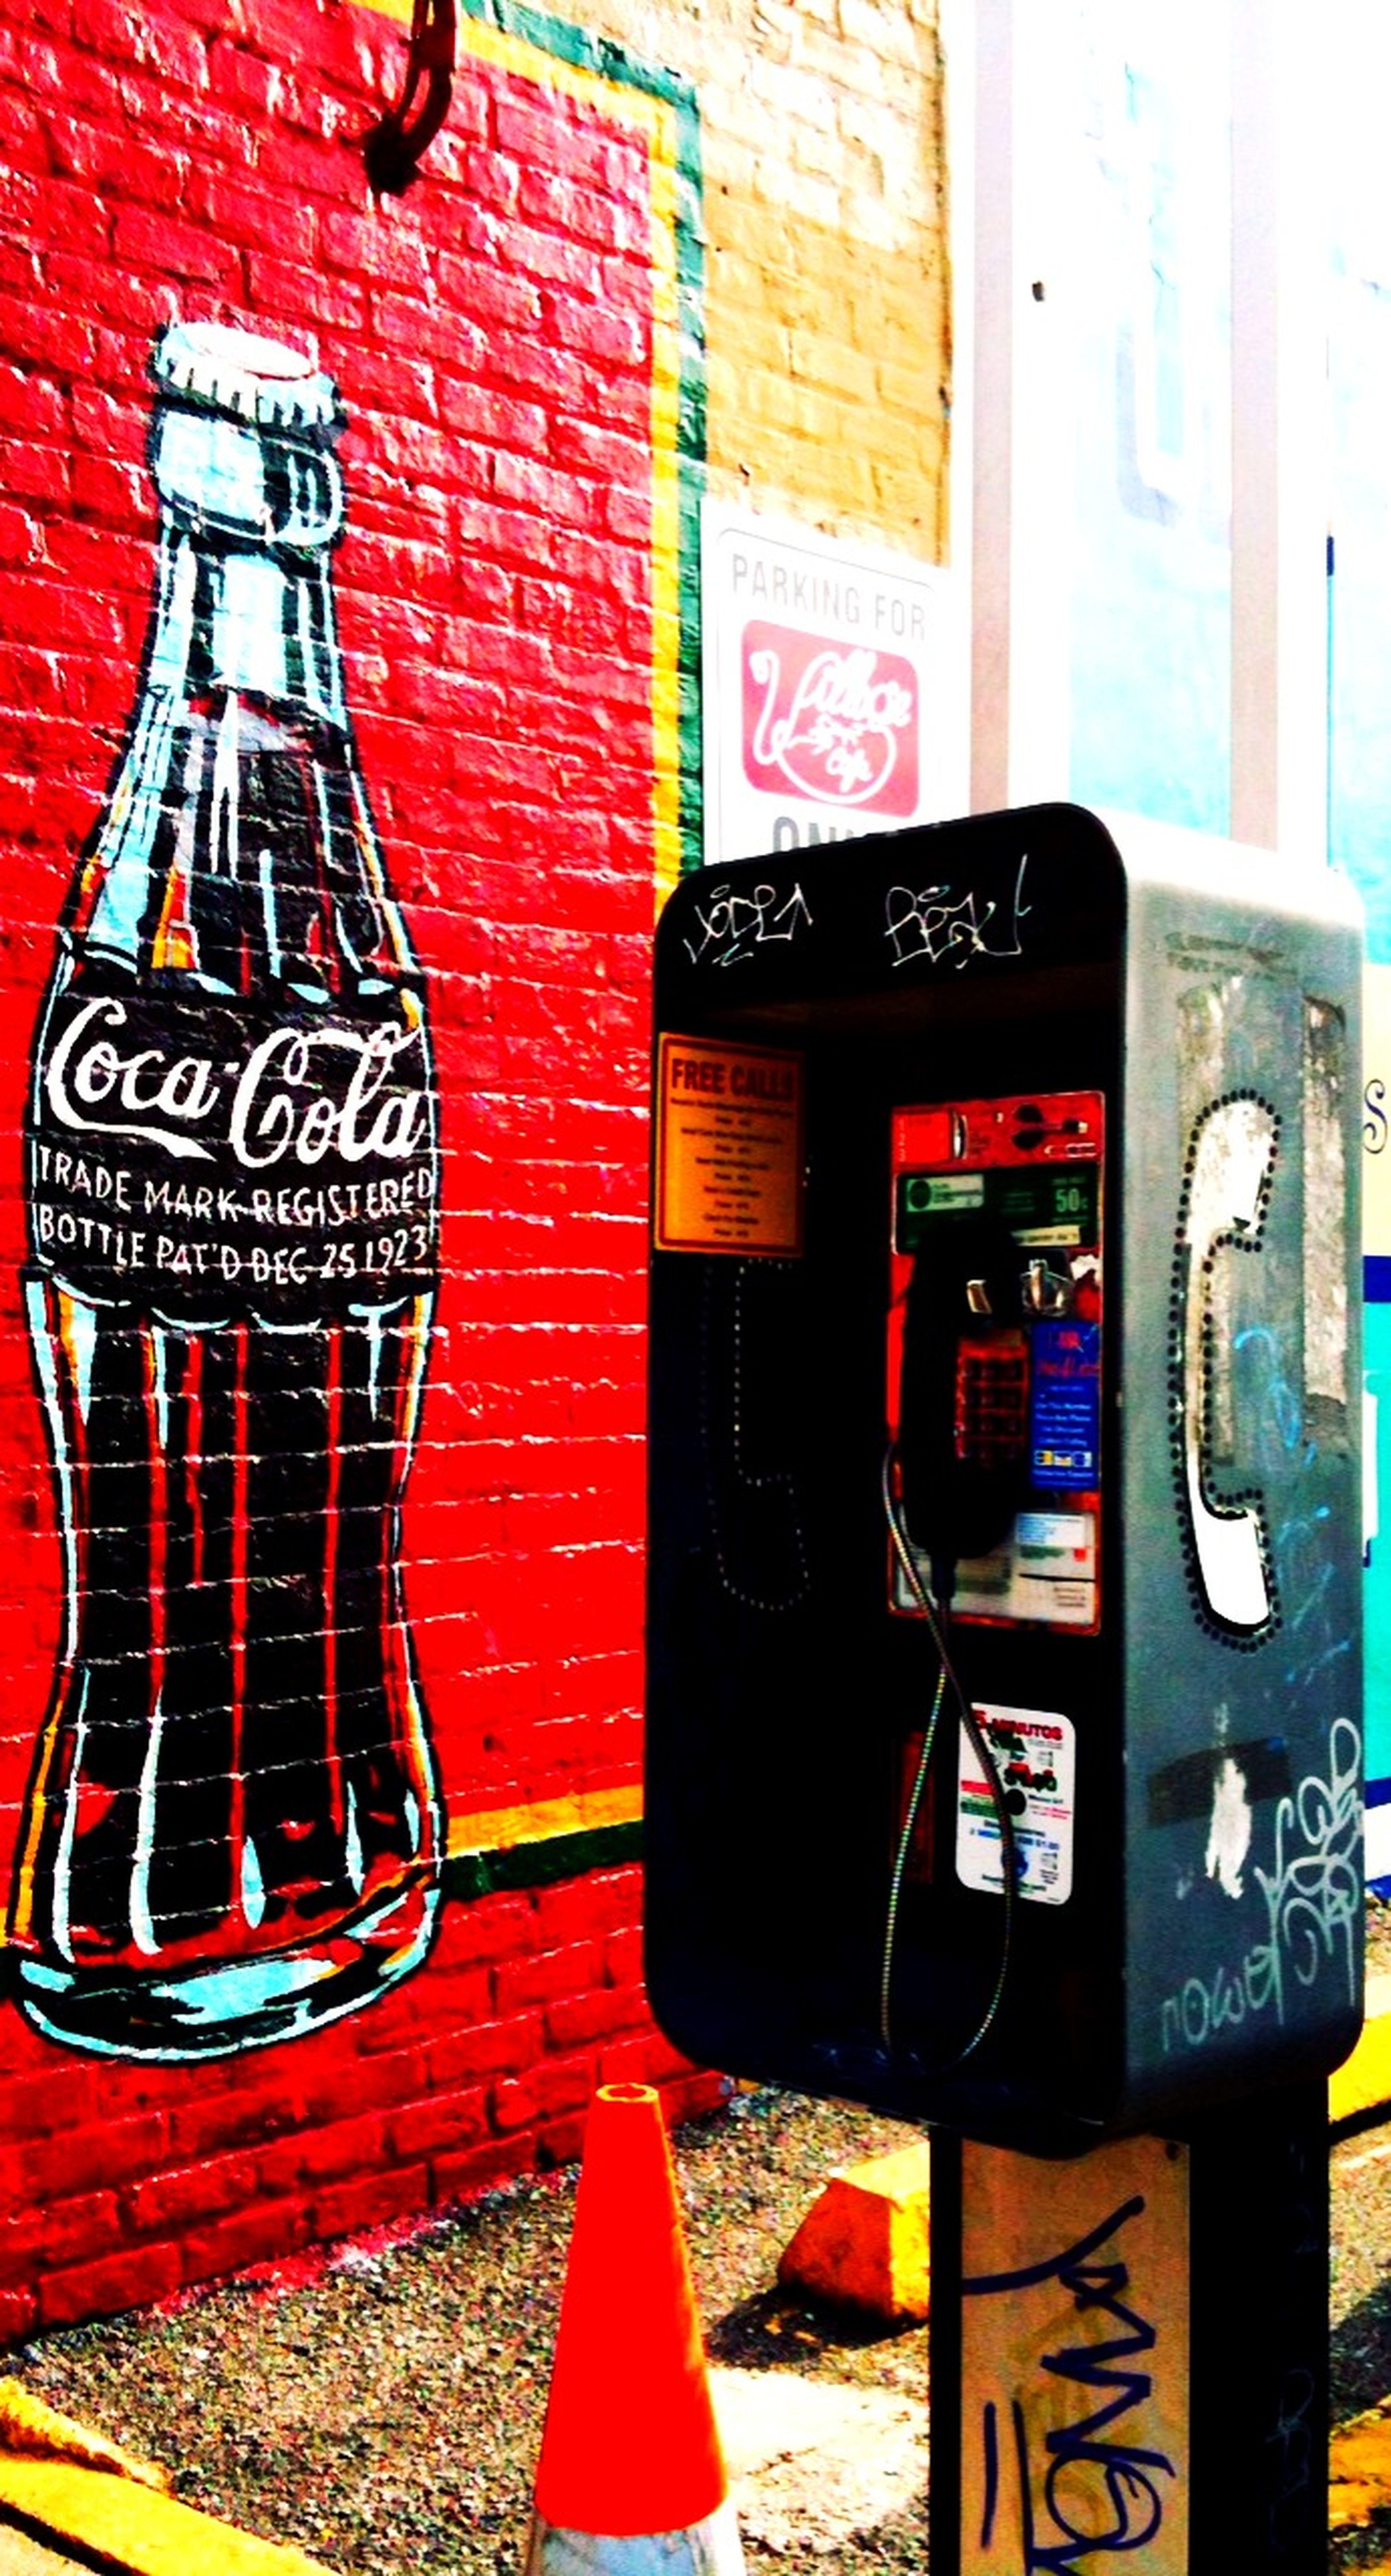 coke & phone at The Village Cafe Coke & Phone